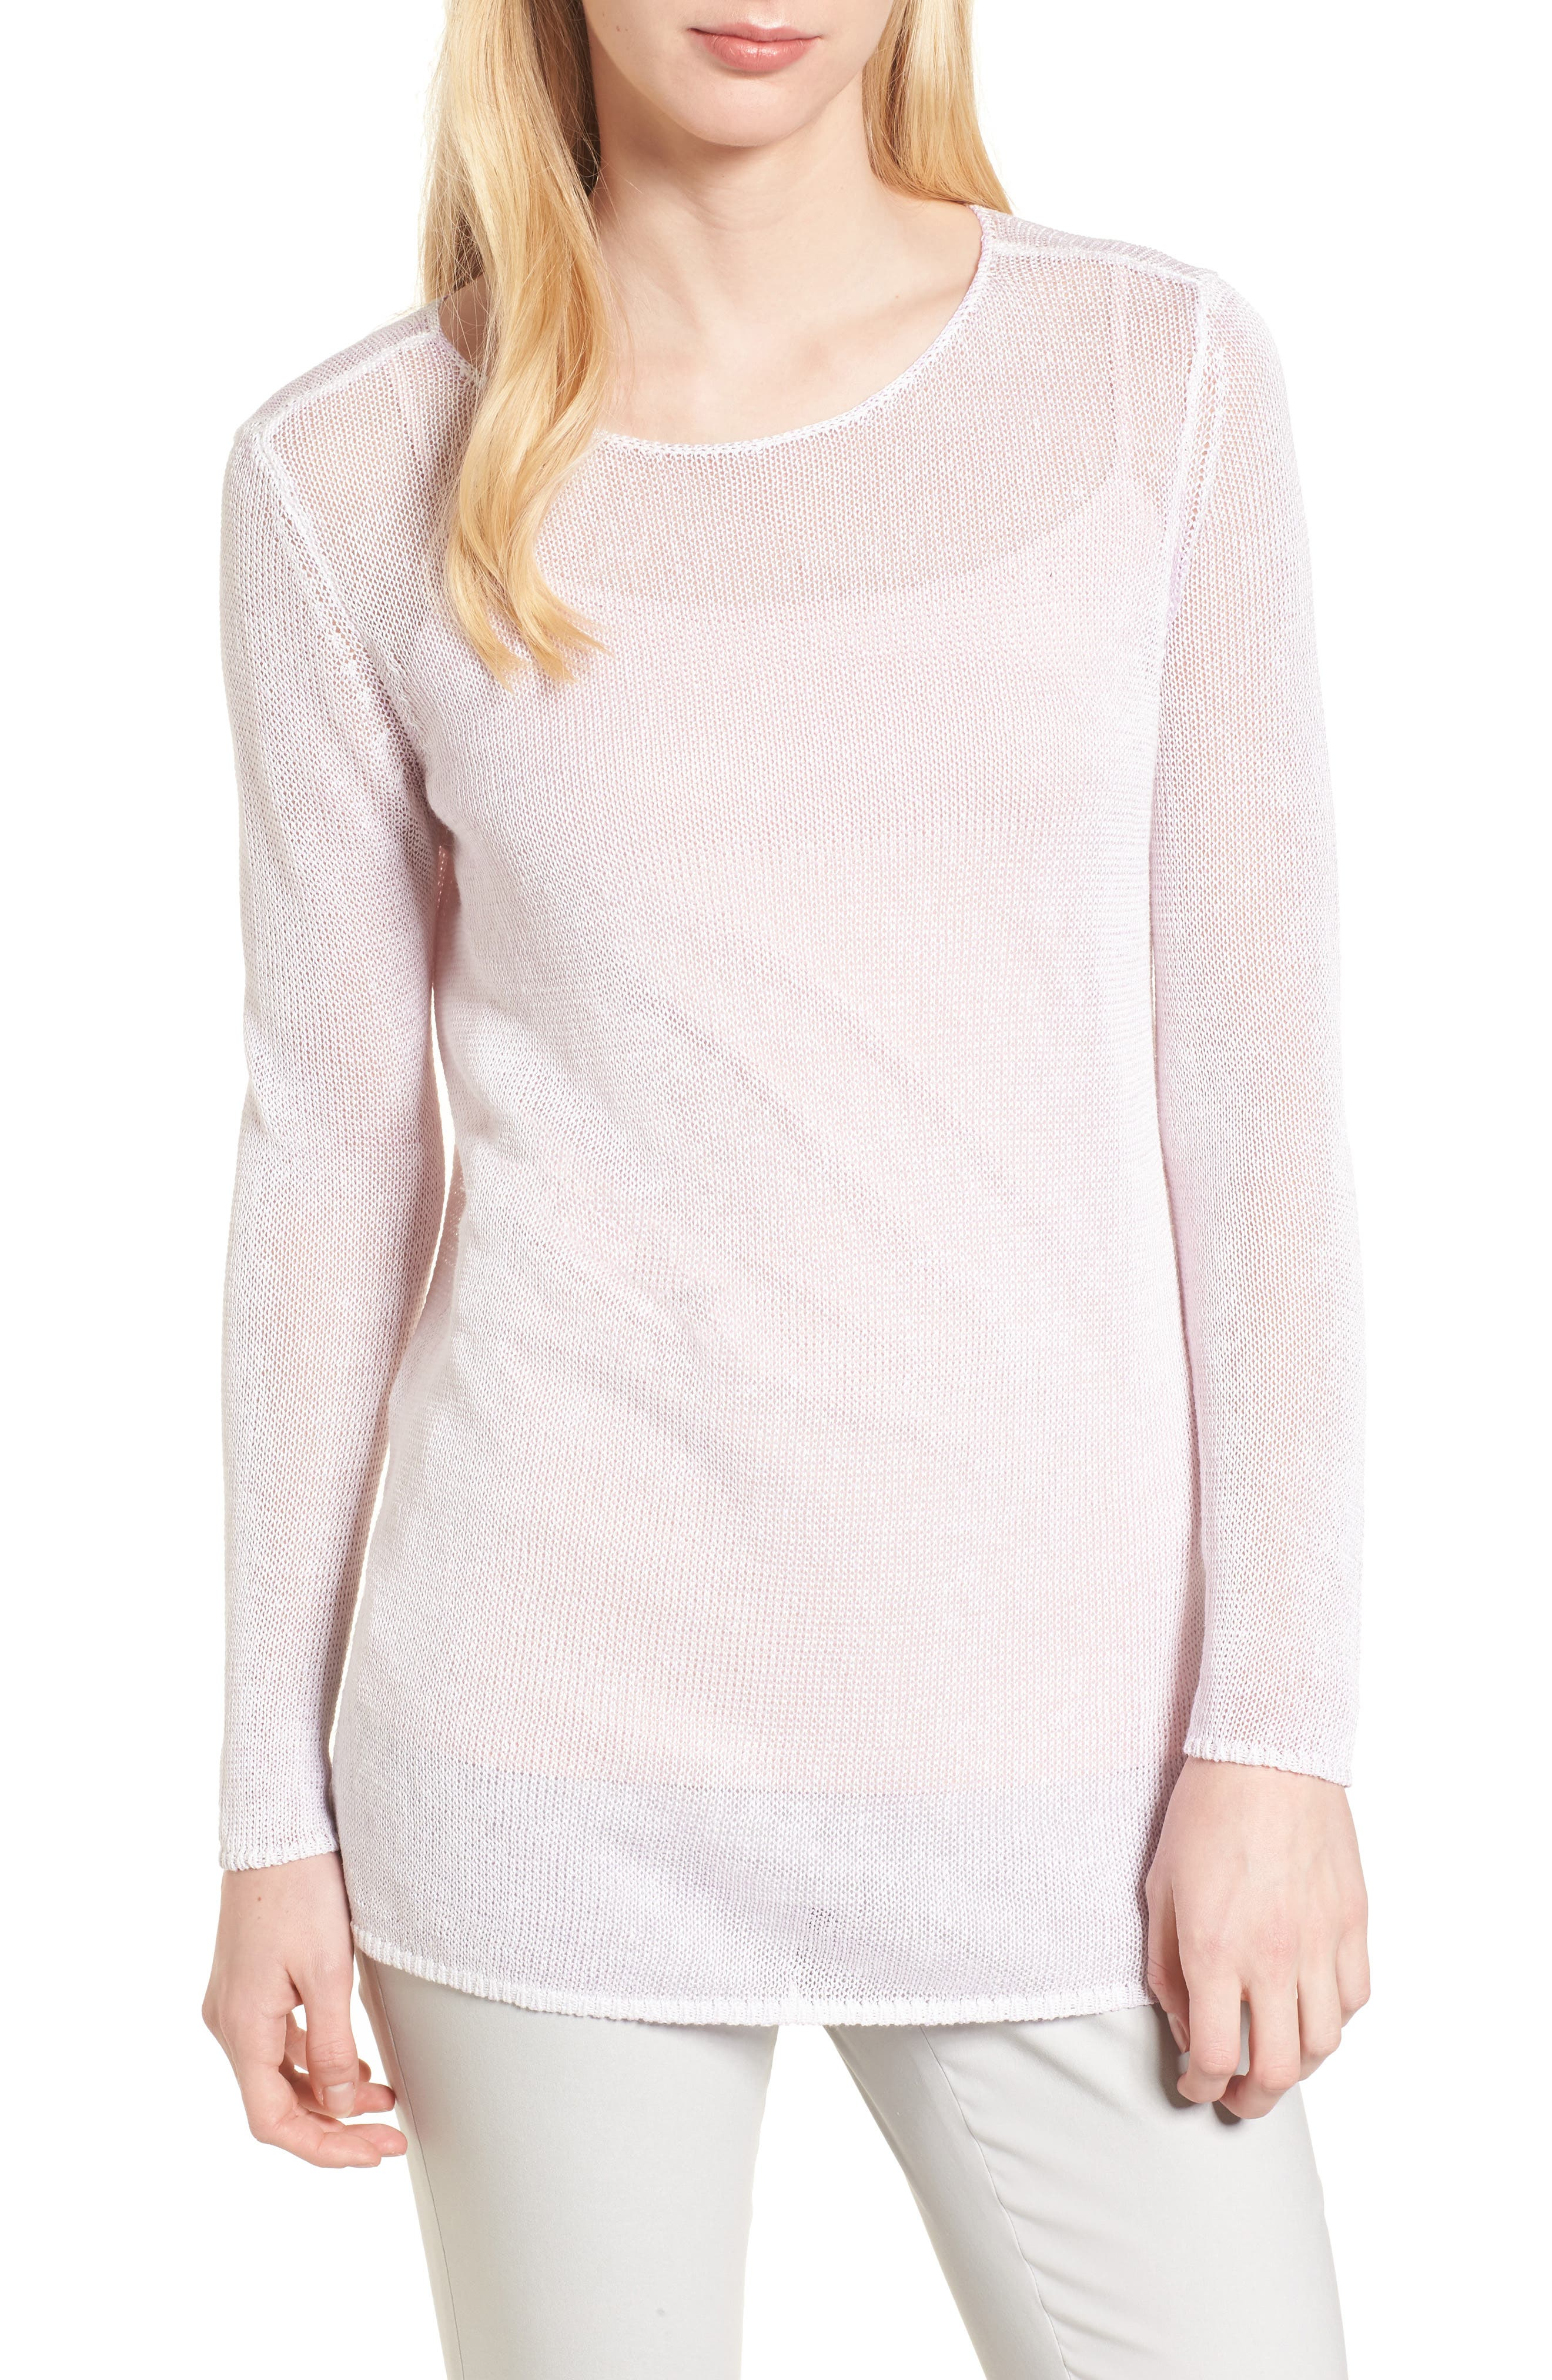 NIC + ZOE Poolside Linen Blend Sweater,                         Main,                         color, Tea Dust